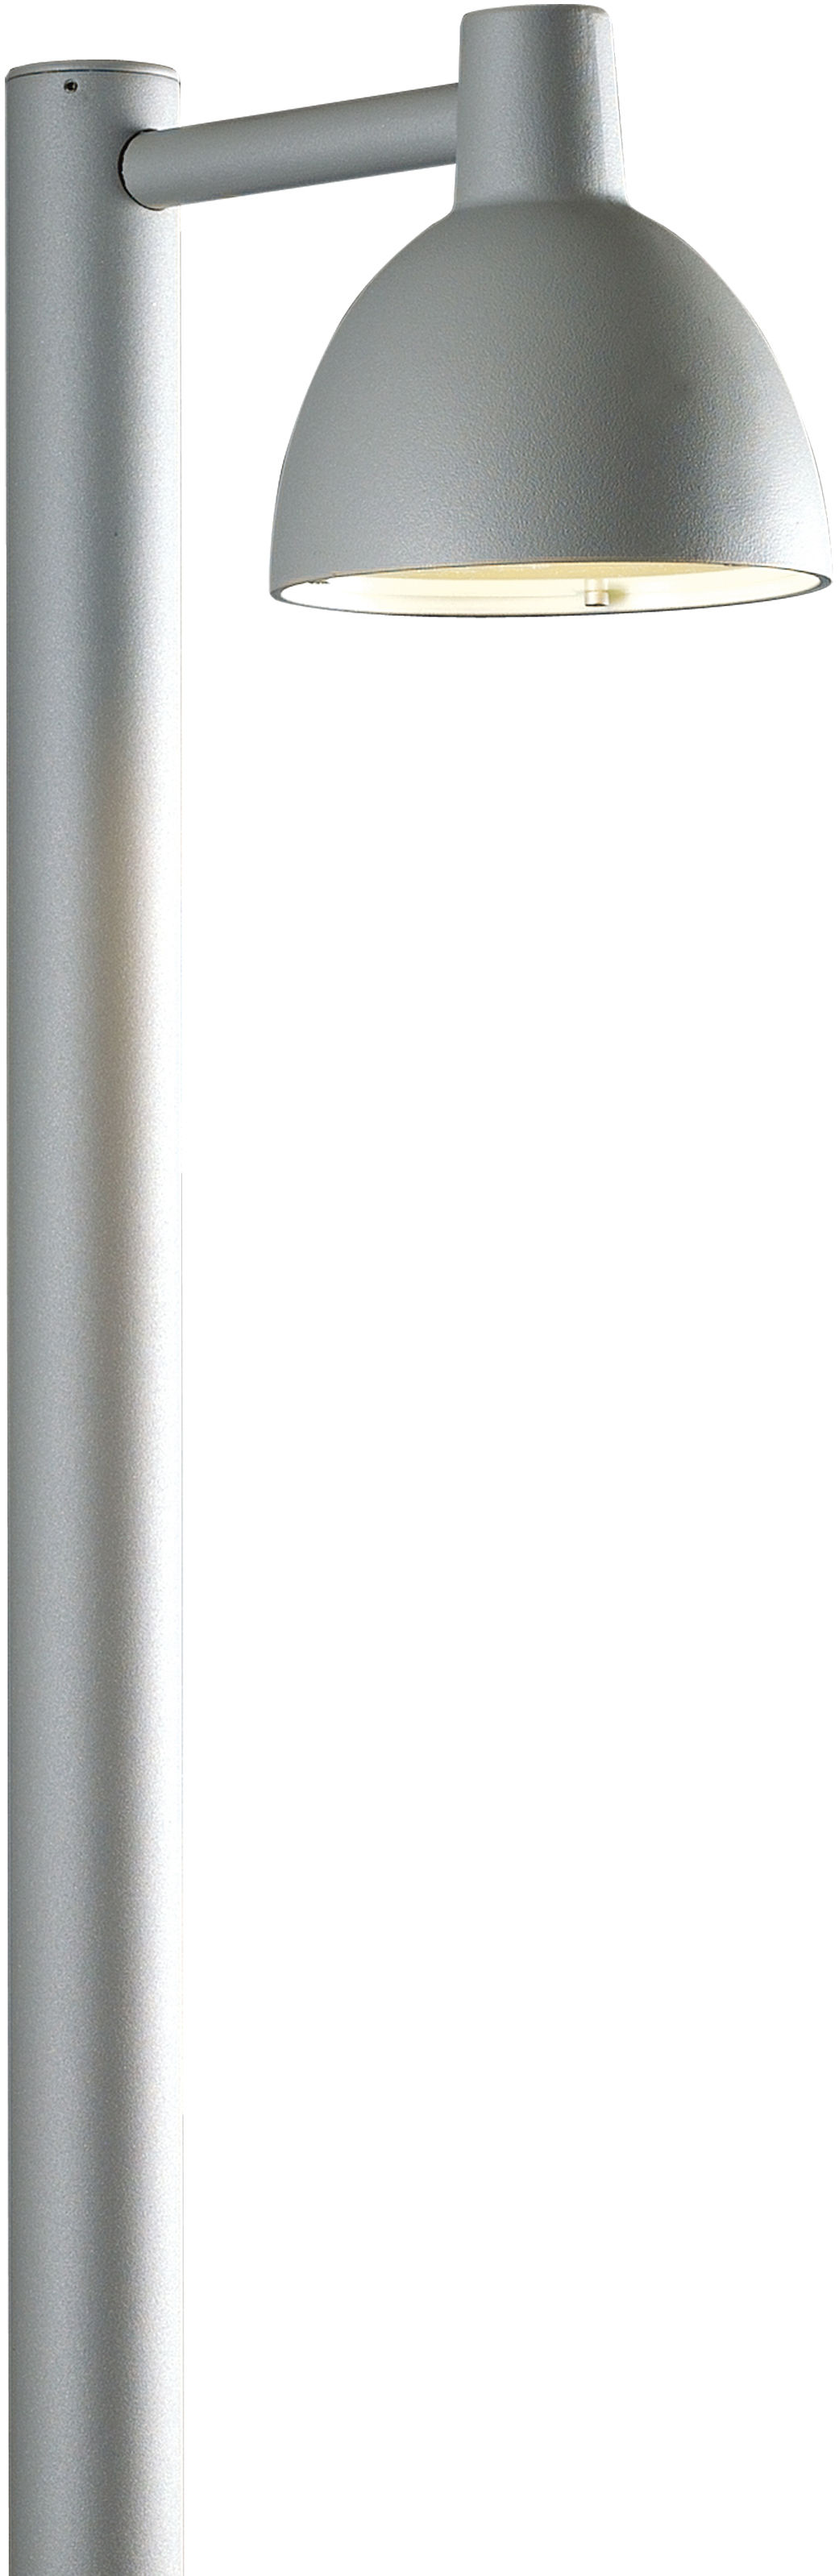 Leuchten - Außenleuchten - Toldbod Lichtsäule / H 90 cm - Louis Poulsen - Aluminium - Aluminium